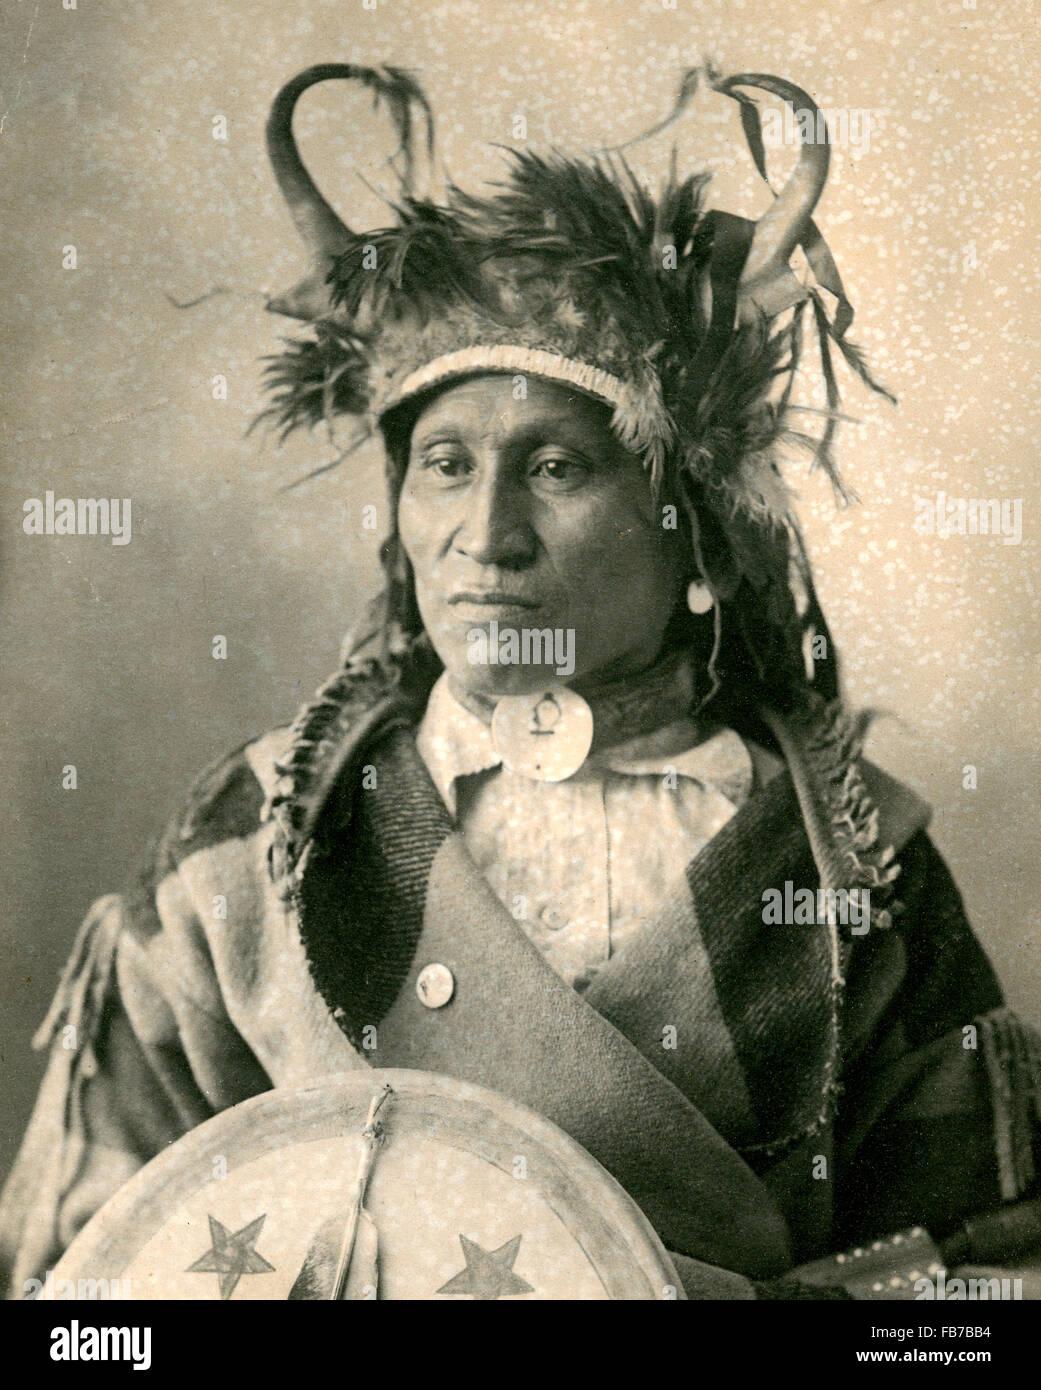 Native American Indian Chief Wetsit Assiniboine